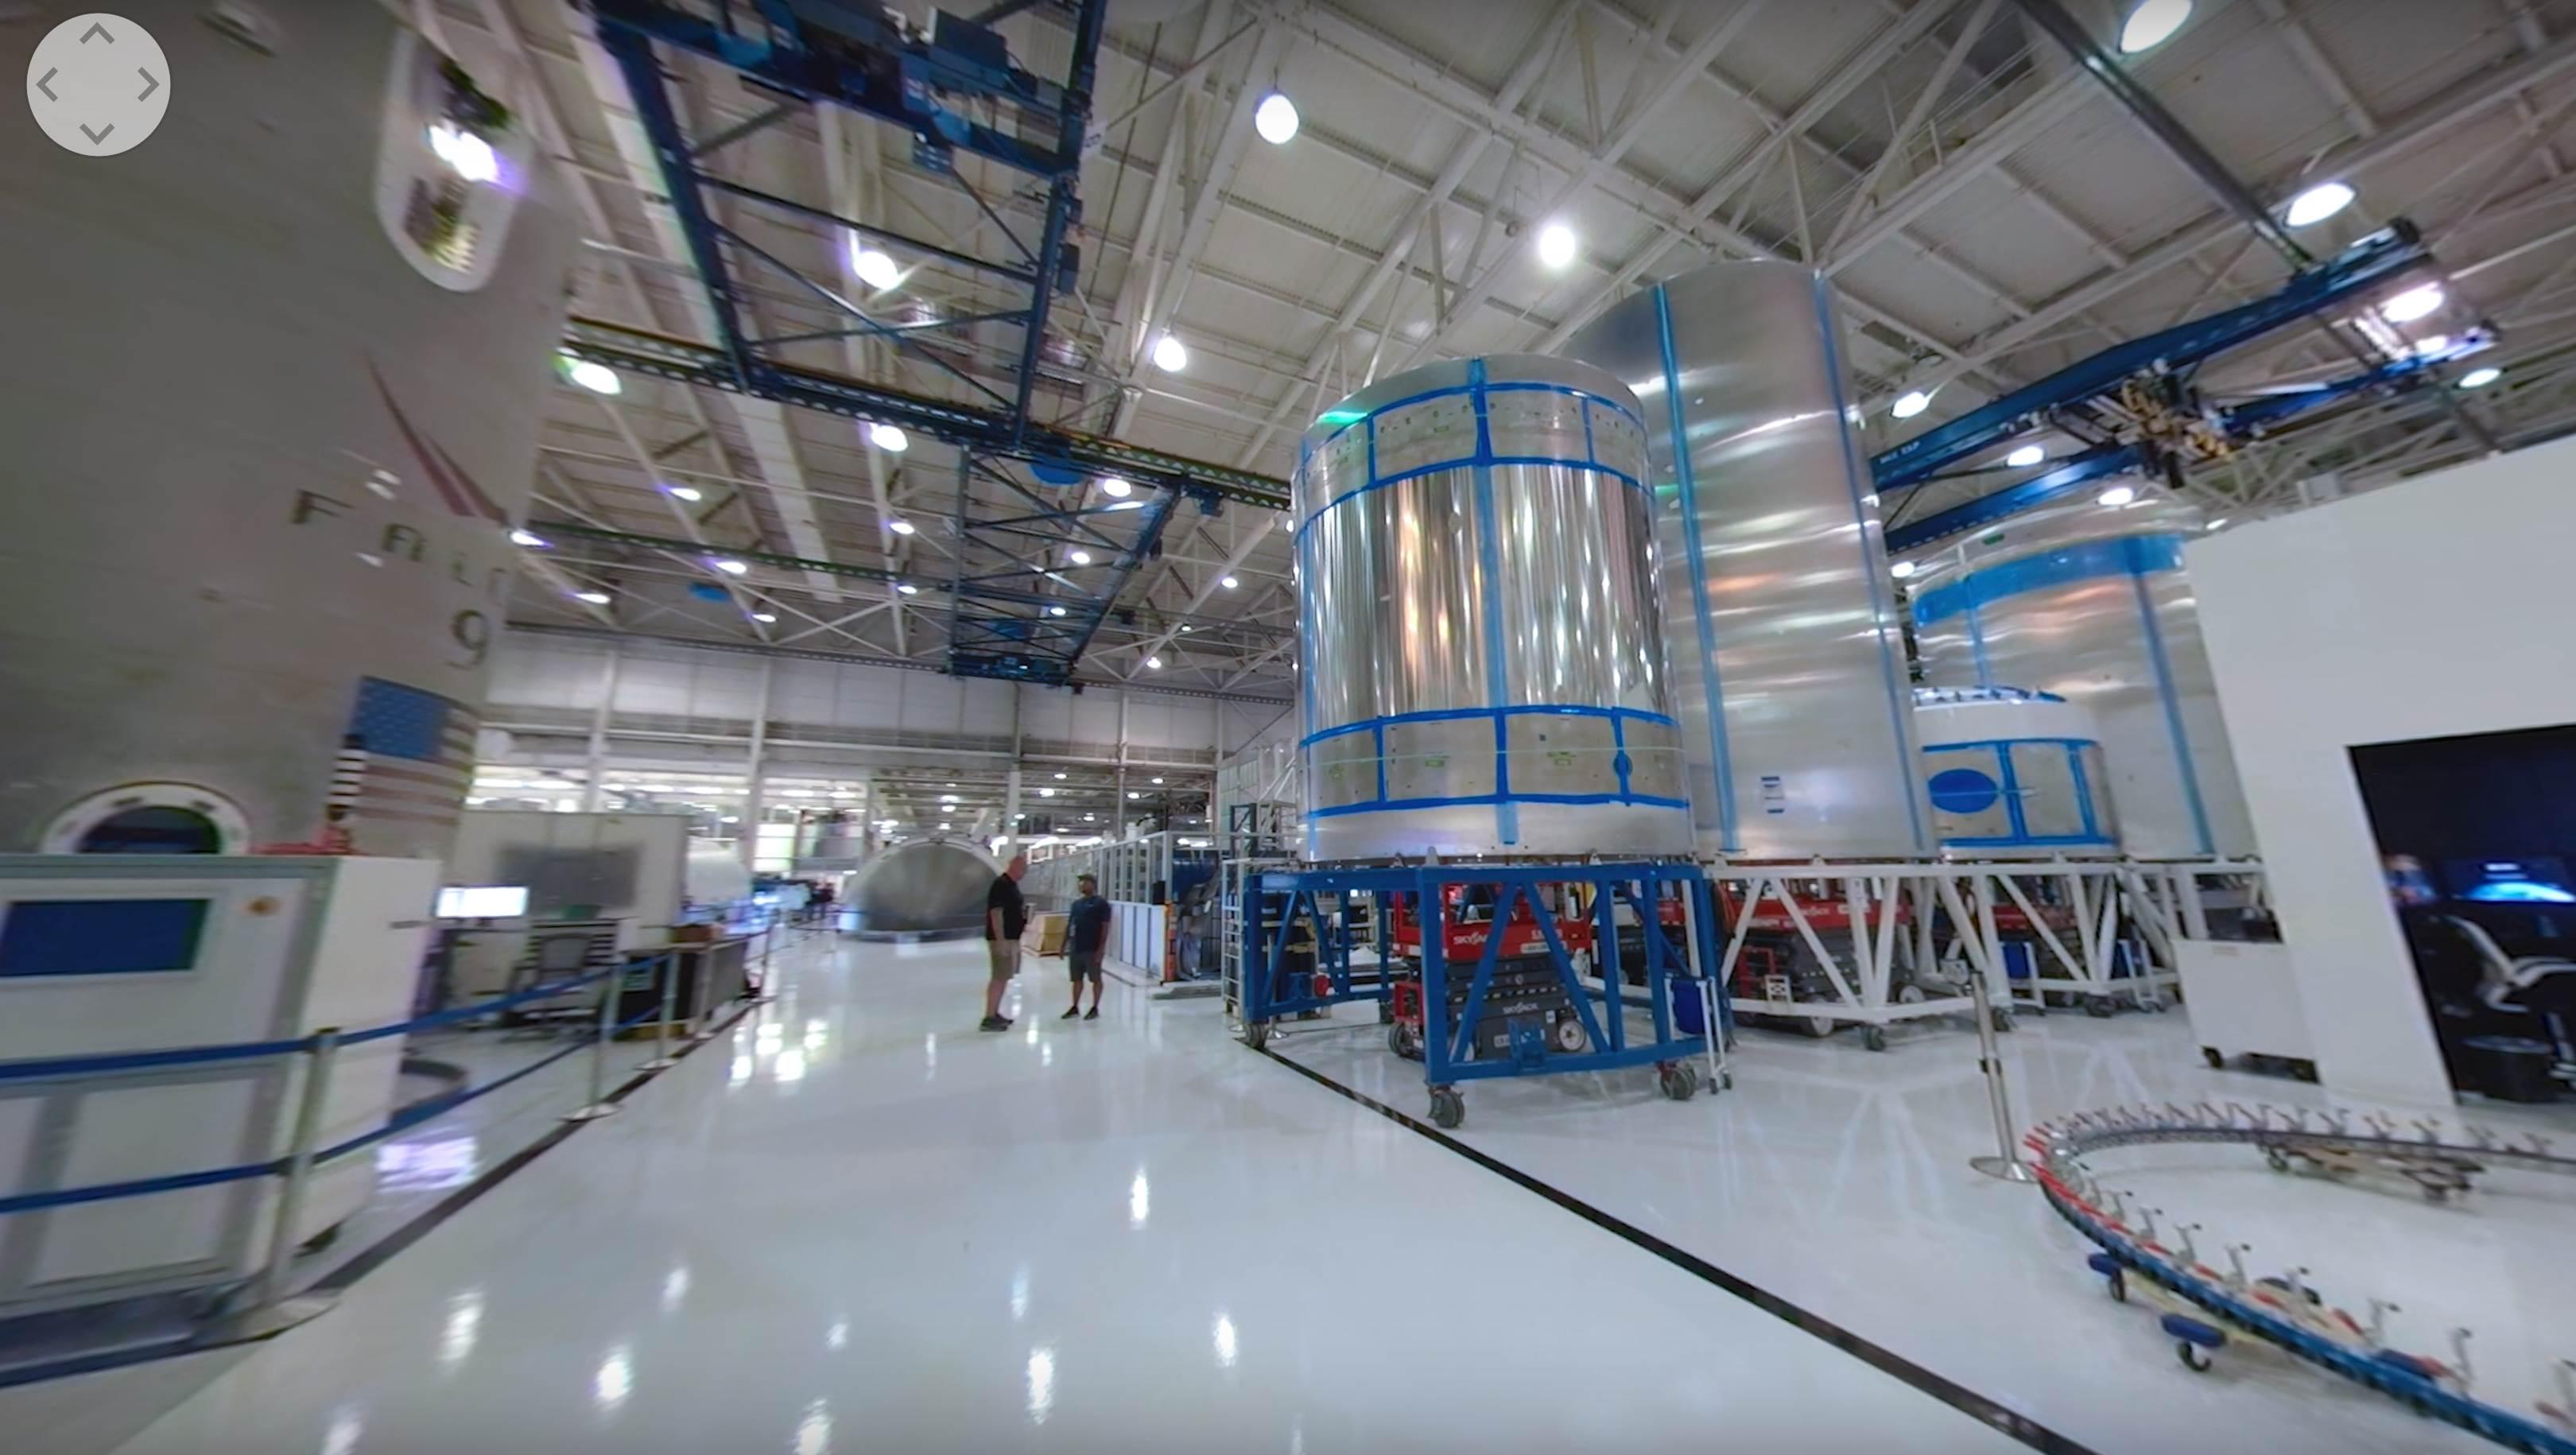 Hawthorne tour 2019 (NASA) Falcon 9 tank land 1 wide